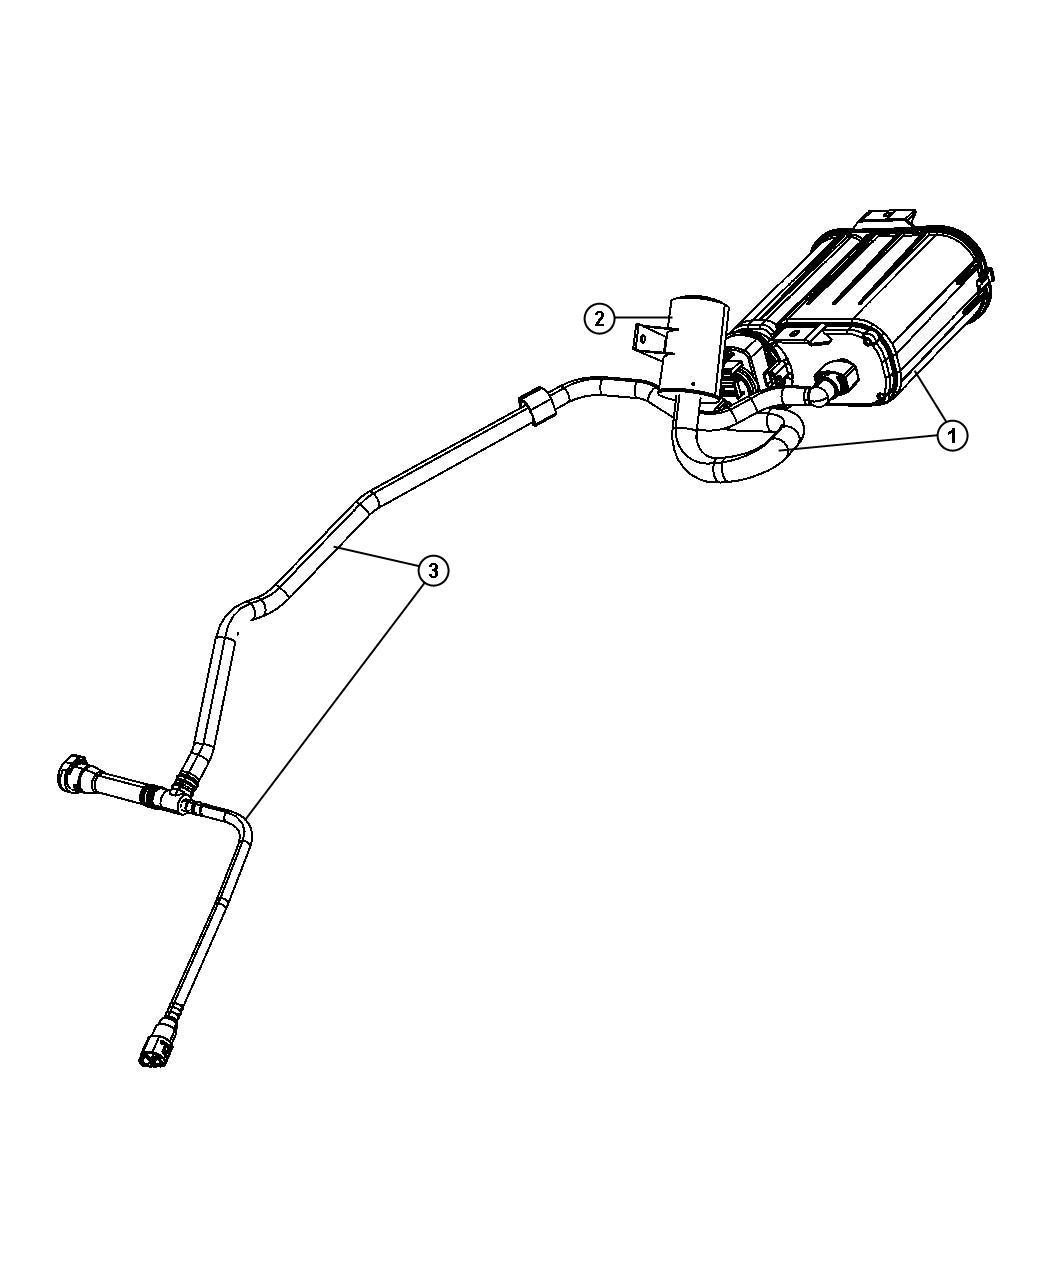 tags: #corvette fuel filter#dodge sprinter 2500 fuel filter#ford fuel filter#fordsel  fuel filter#fuel filter replacement#dodge fuel filter replacement#gm